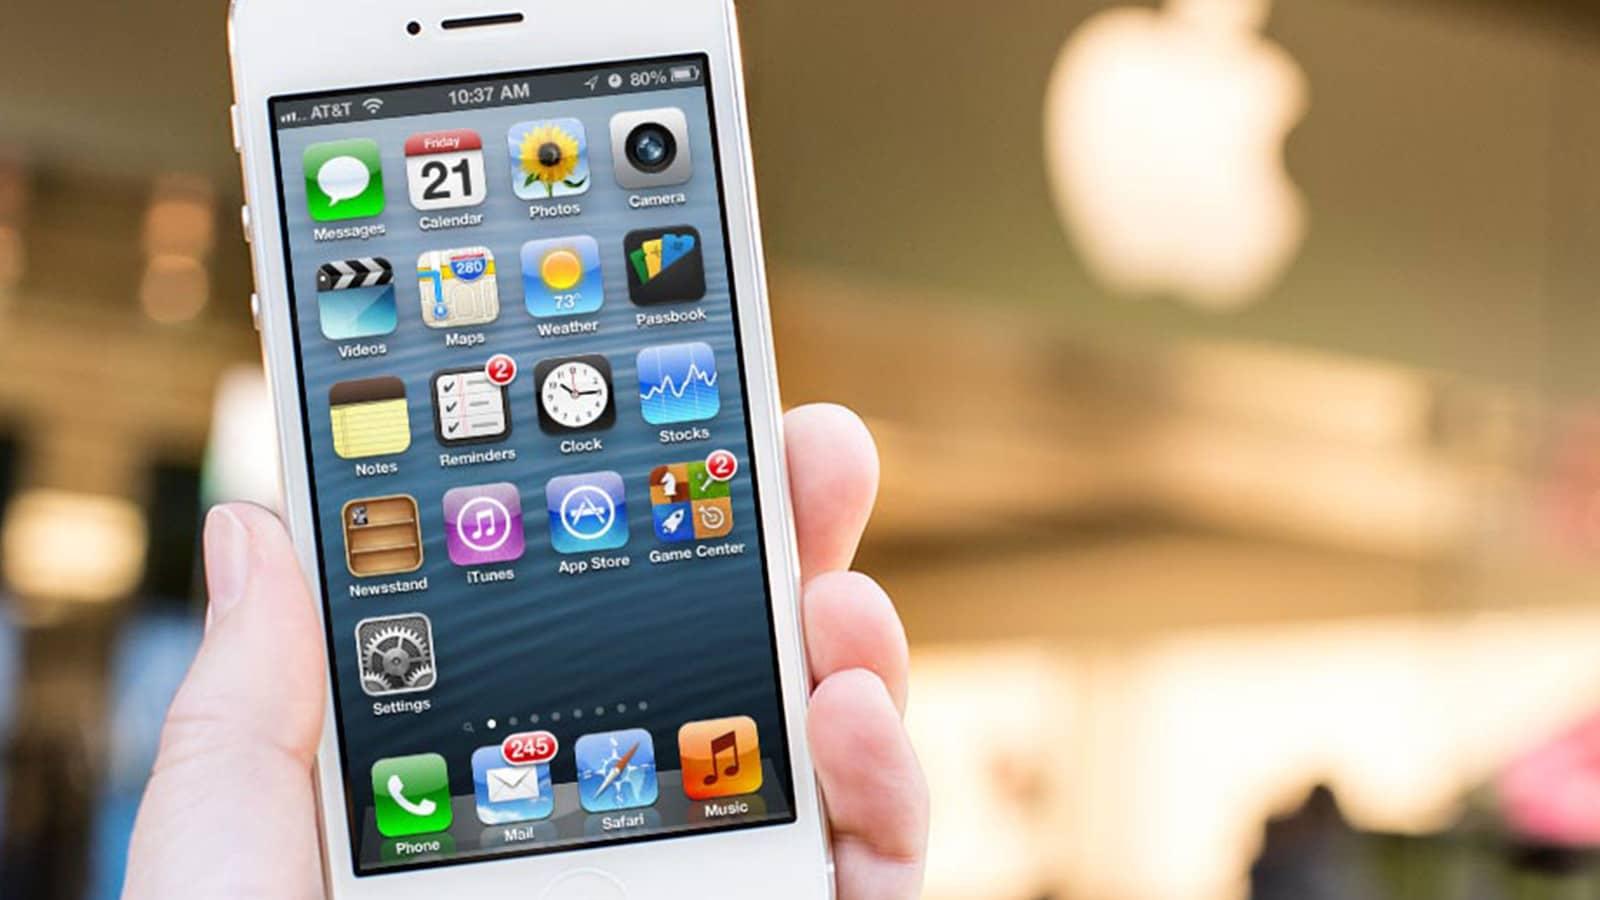 iphone 5 apple store hero 4x3